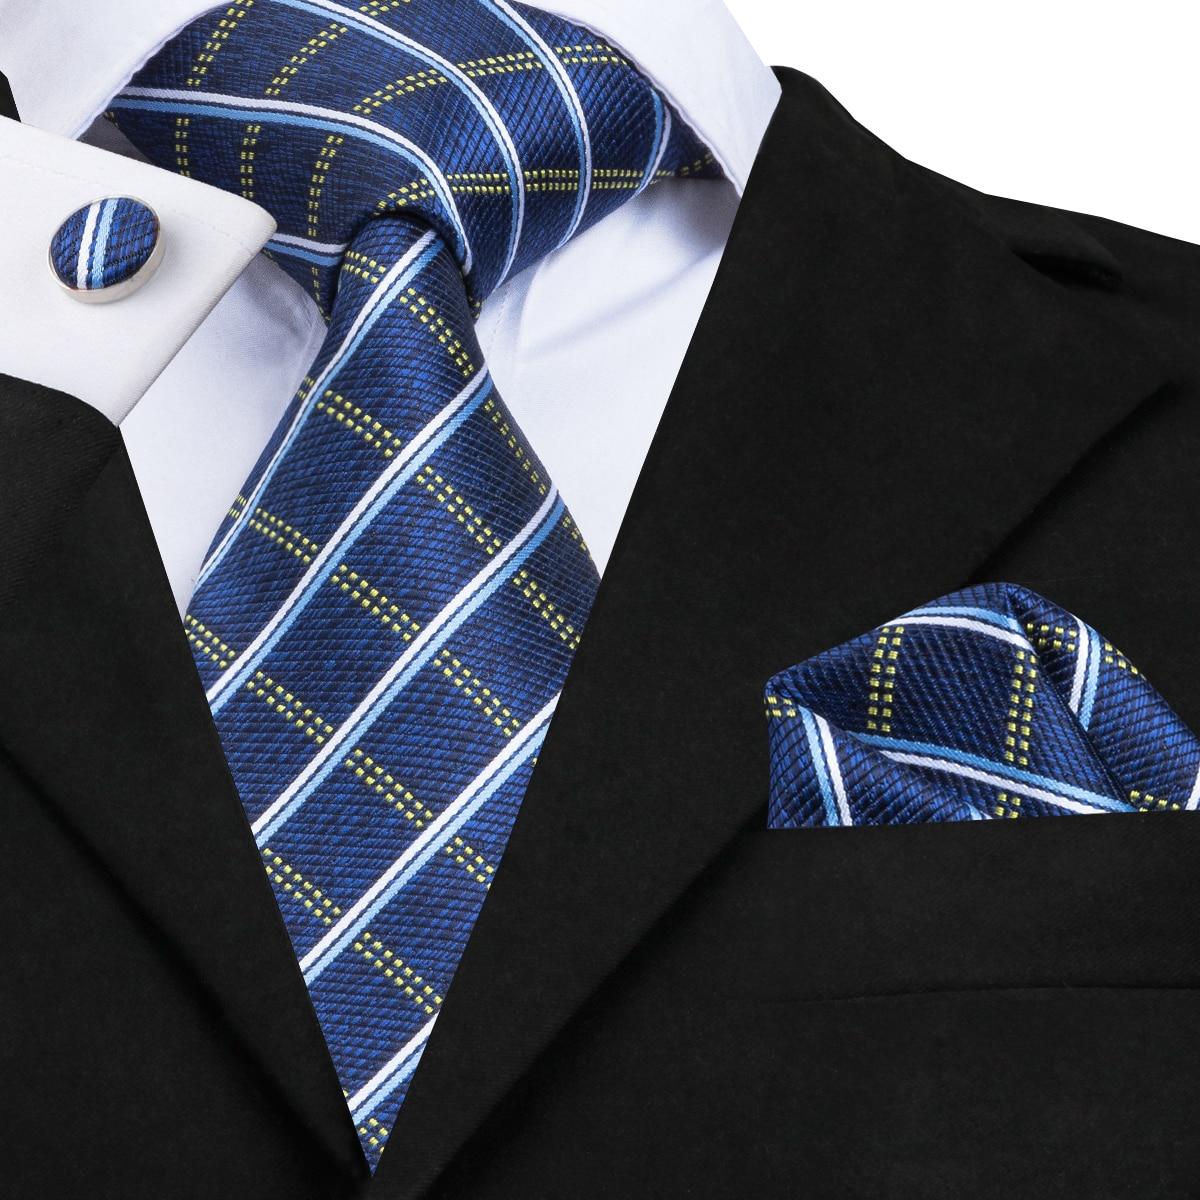 SN-1673 Hi-Tie Designer Classic Blue Plaid Ties For Men High Quality Silk Necktie Handkerchief Cufflinks 8.5cm Business Suit Tie